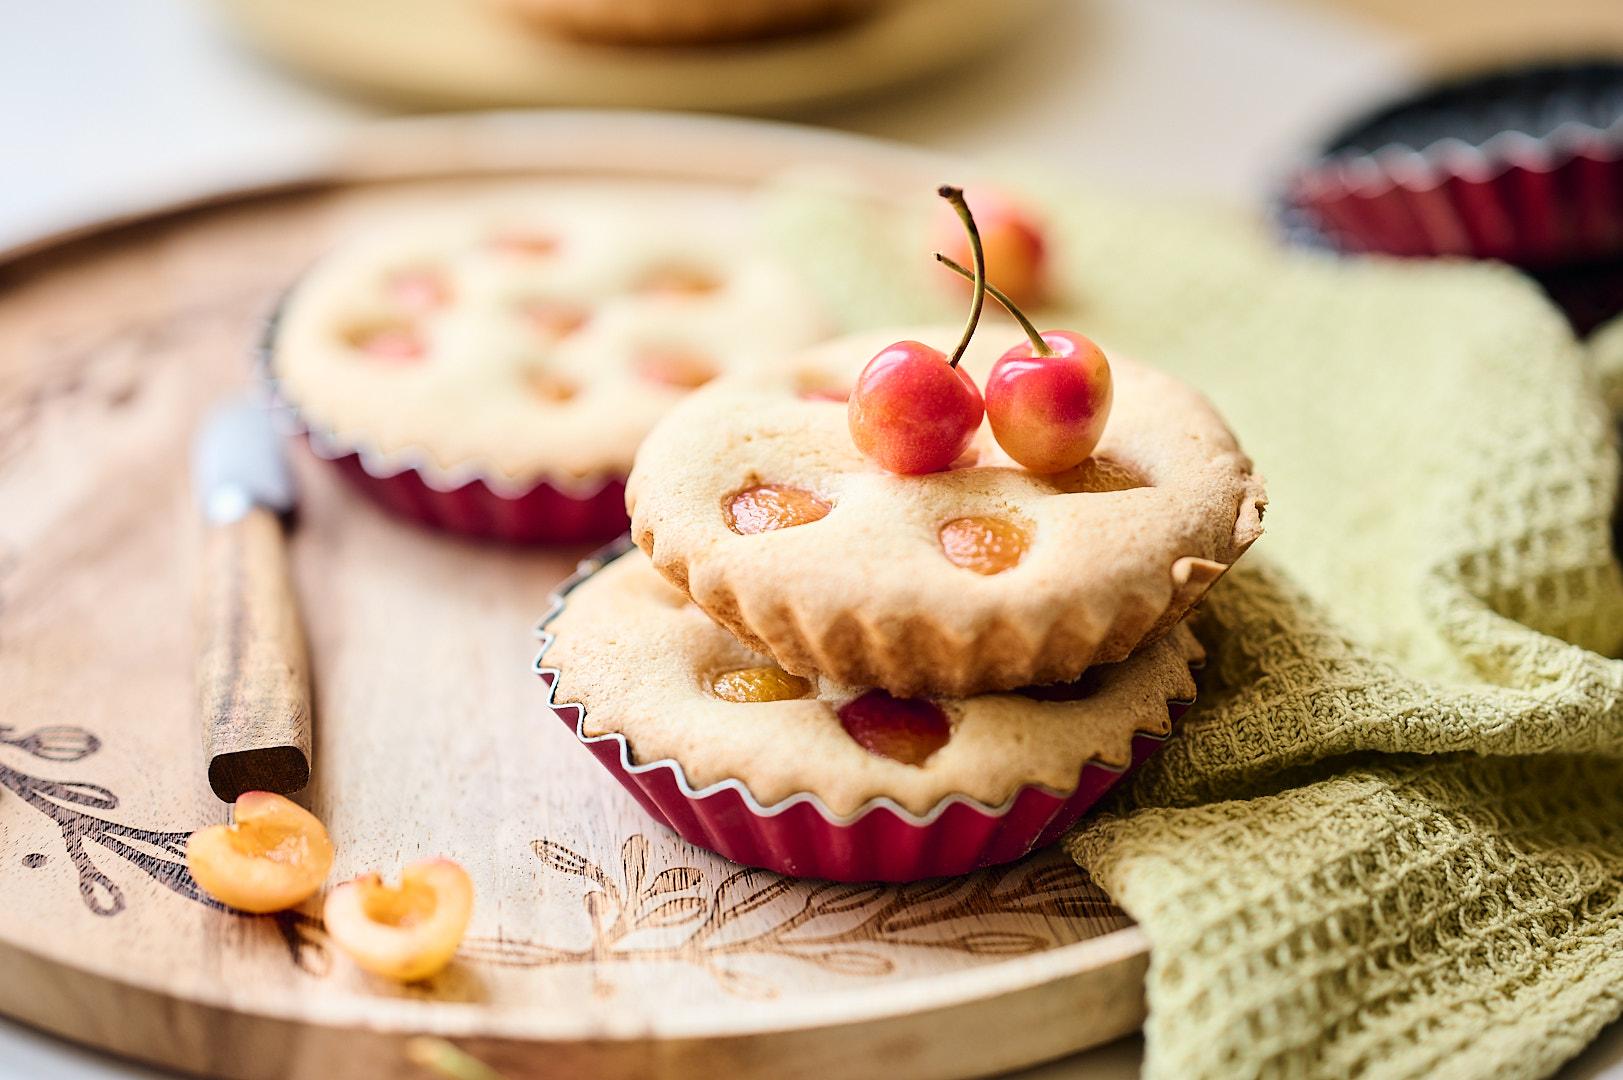 Gâteau rapide aux cerises